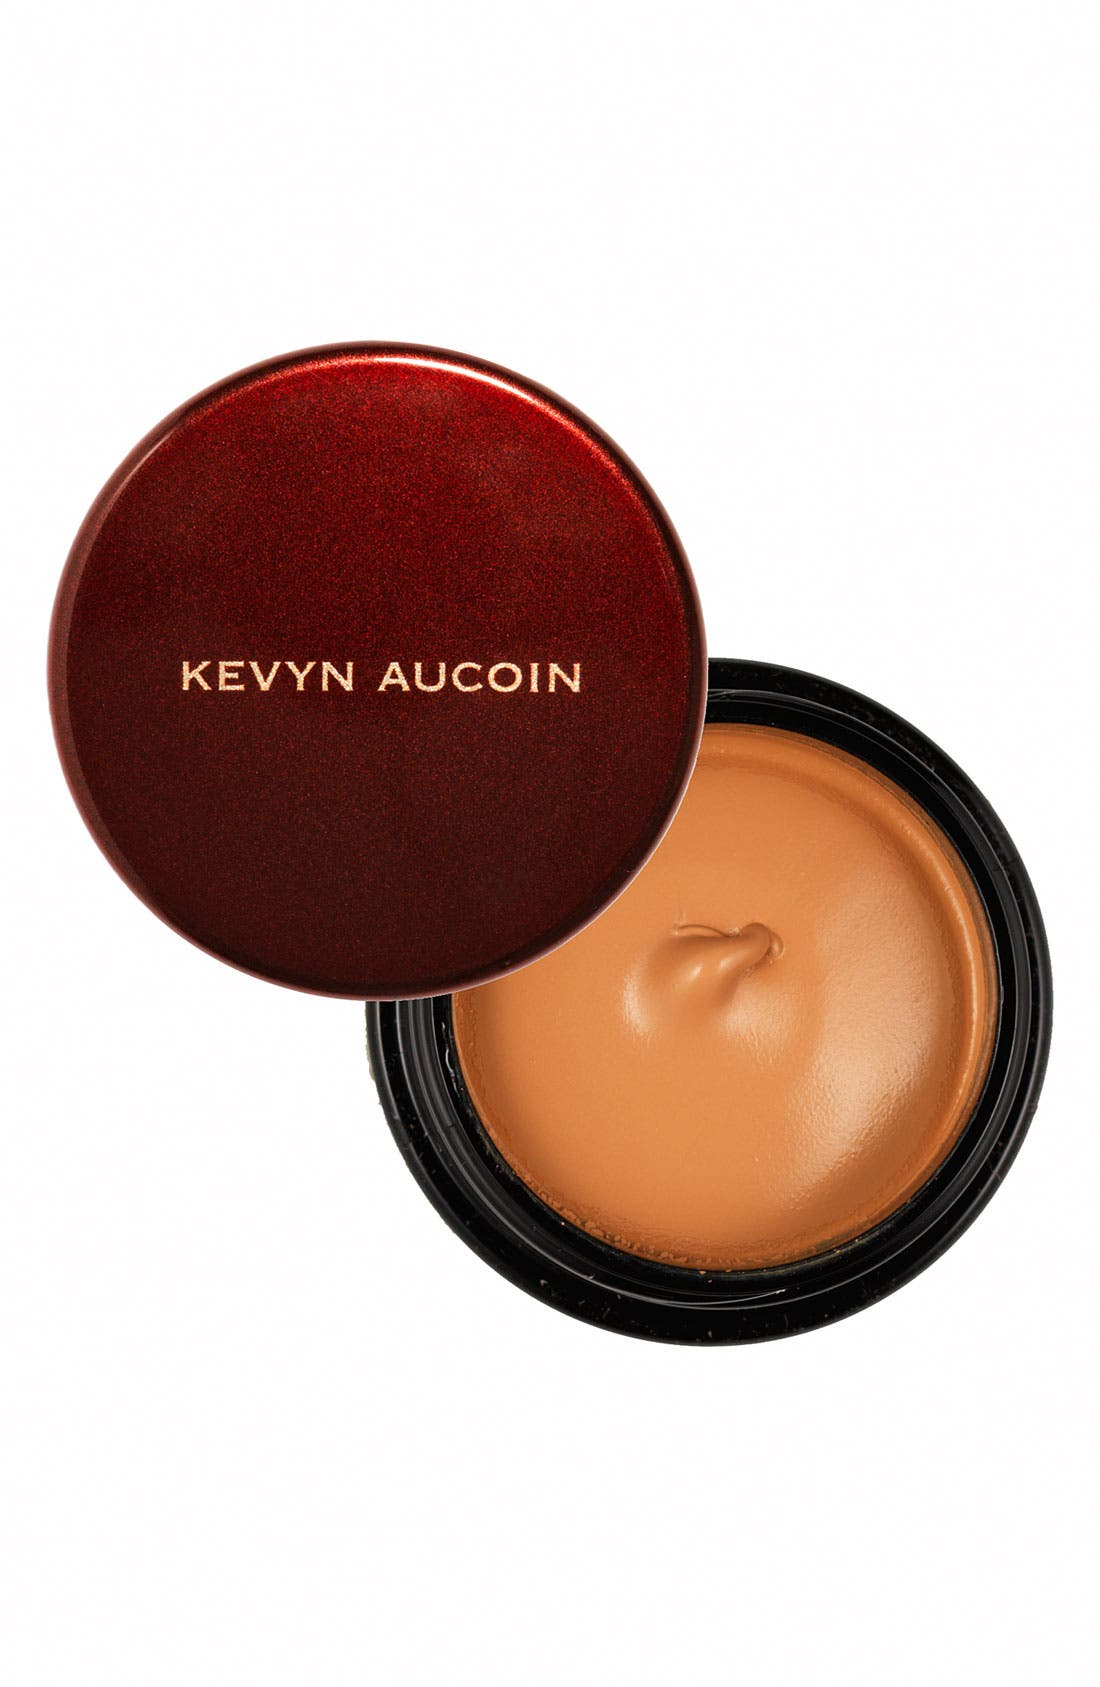 SPACE.NK.apothecary Kevyn Aucoin Beauty The Sensual Skin Enhancer